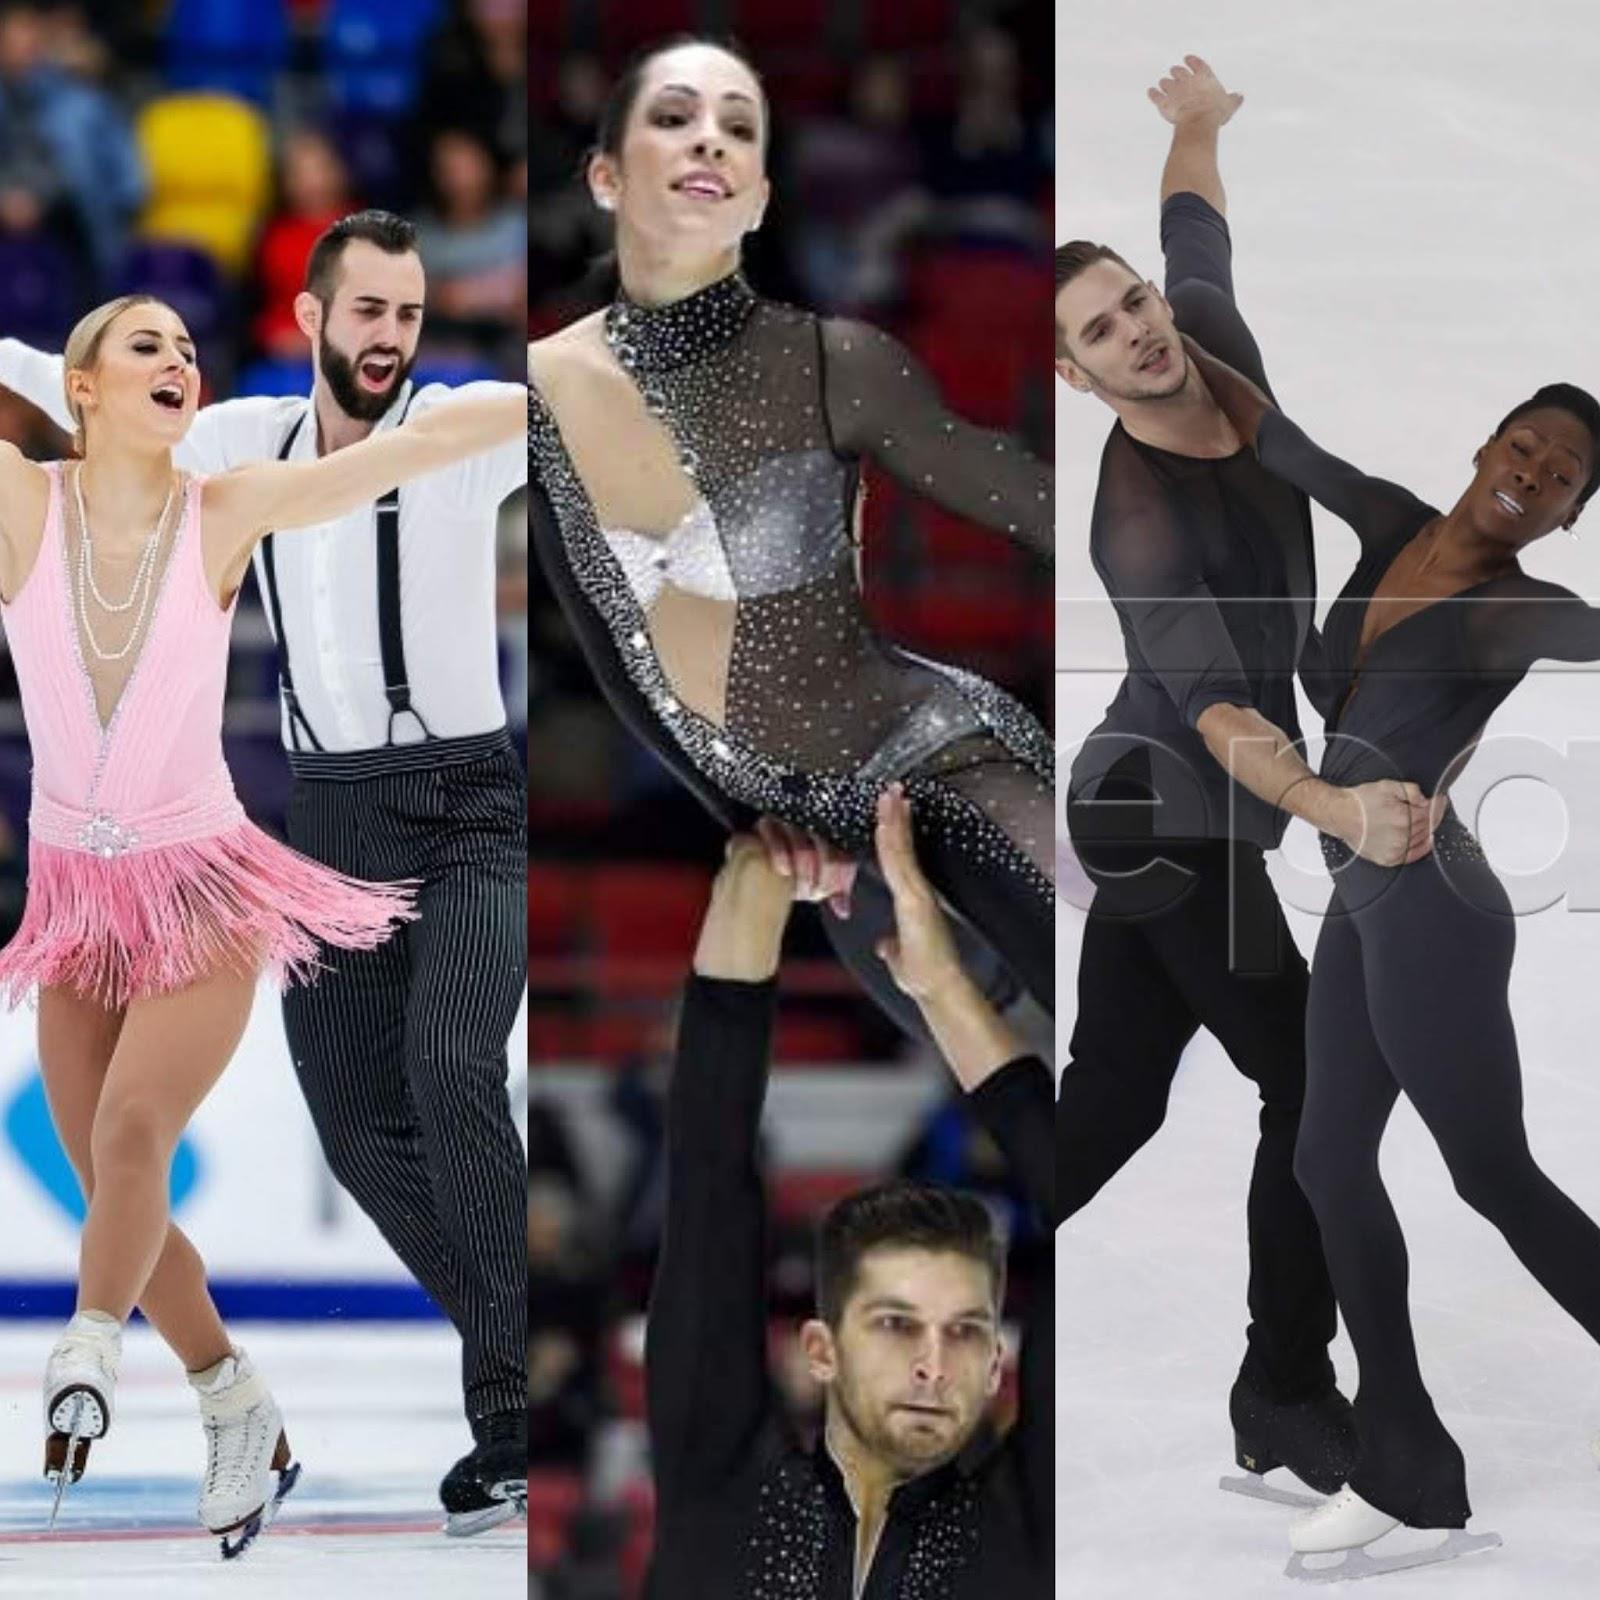 Nick Verreos Ice Style 2018 Costumes Recap Figure Skating Costumes 2018 Pairs